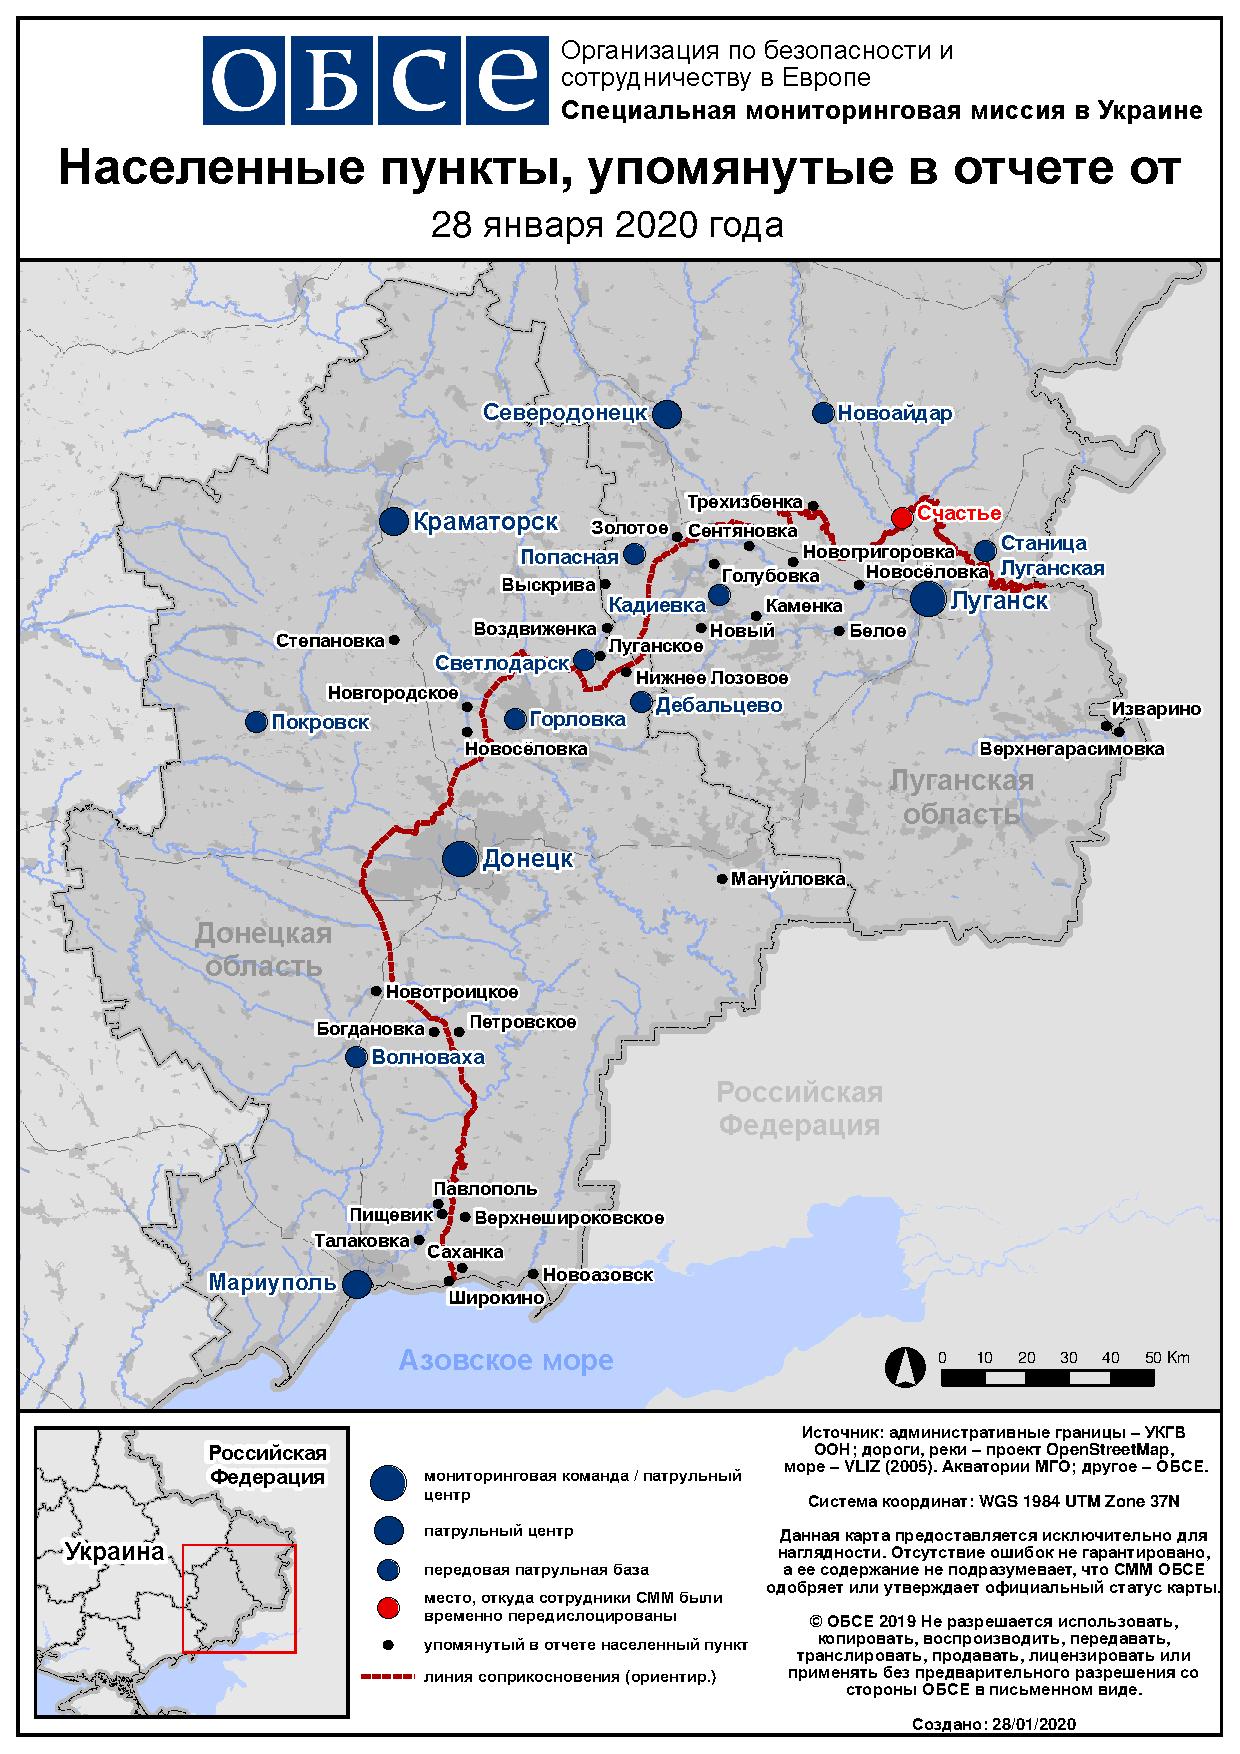 map_settlements--2020-01-27